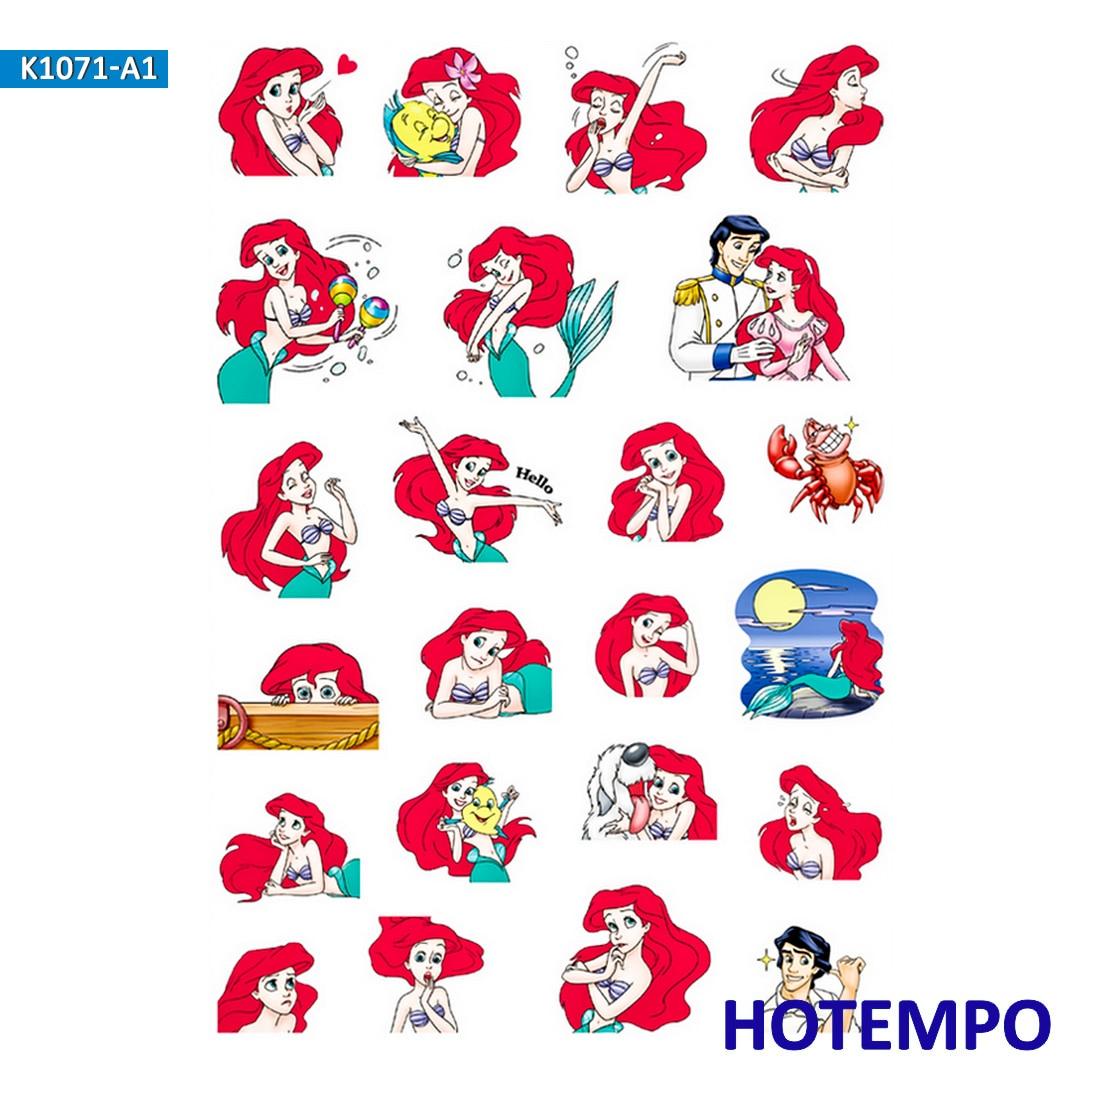 Mermaid Ariel Princess Cartoon Stickers Girl Children Kids Gift DIY Letter Diary Scrapbooking Stationery Pegatinas  Stickers